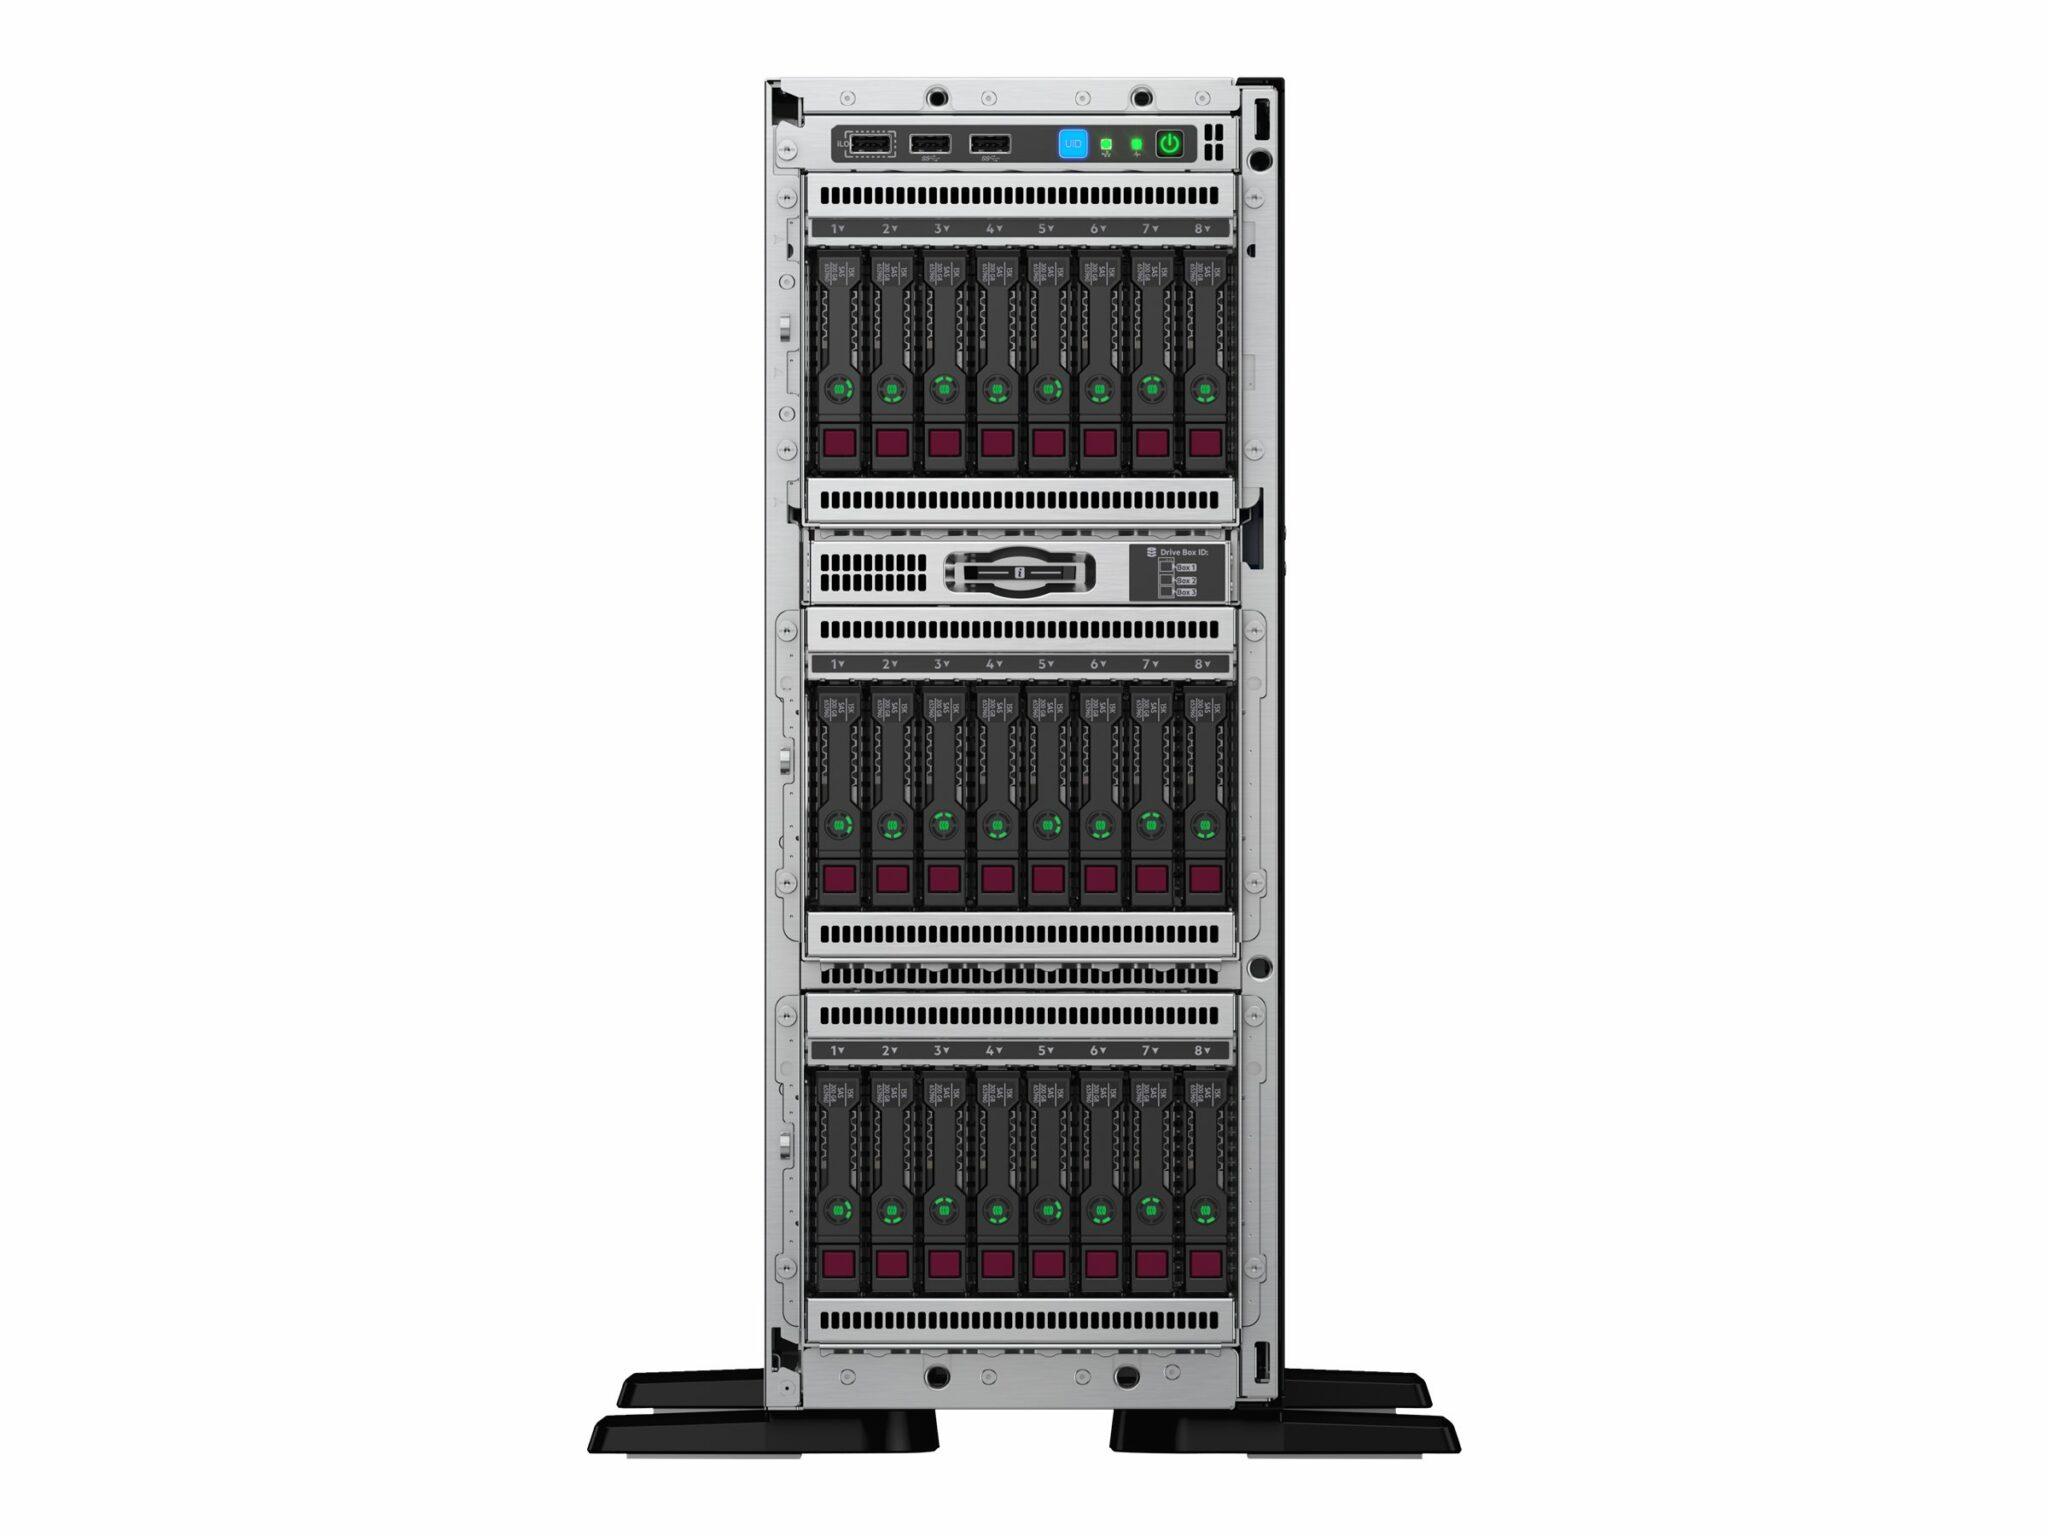 Hpe-proliant-ml350-gen10-entry-server-tower-4u-2-way-1-x-xeon-bronze-3106-1-7-ghz-ram-16-gb-sata